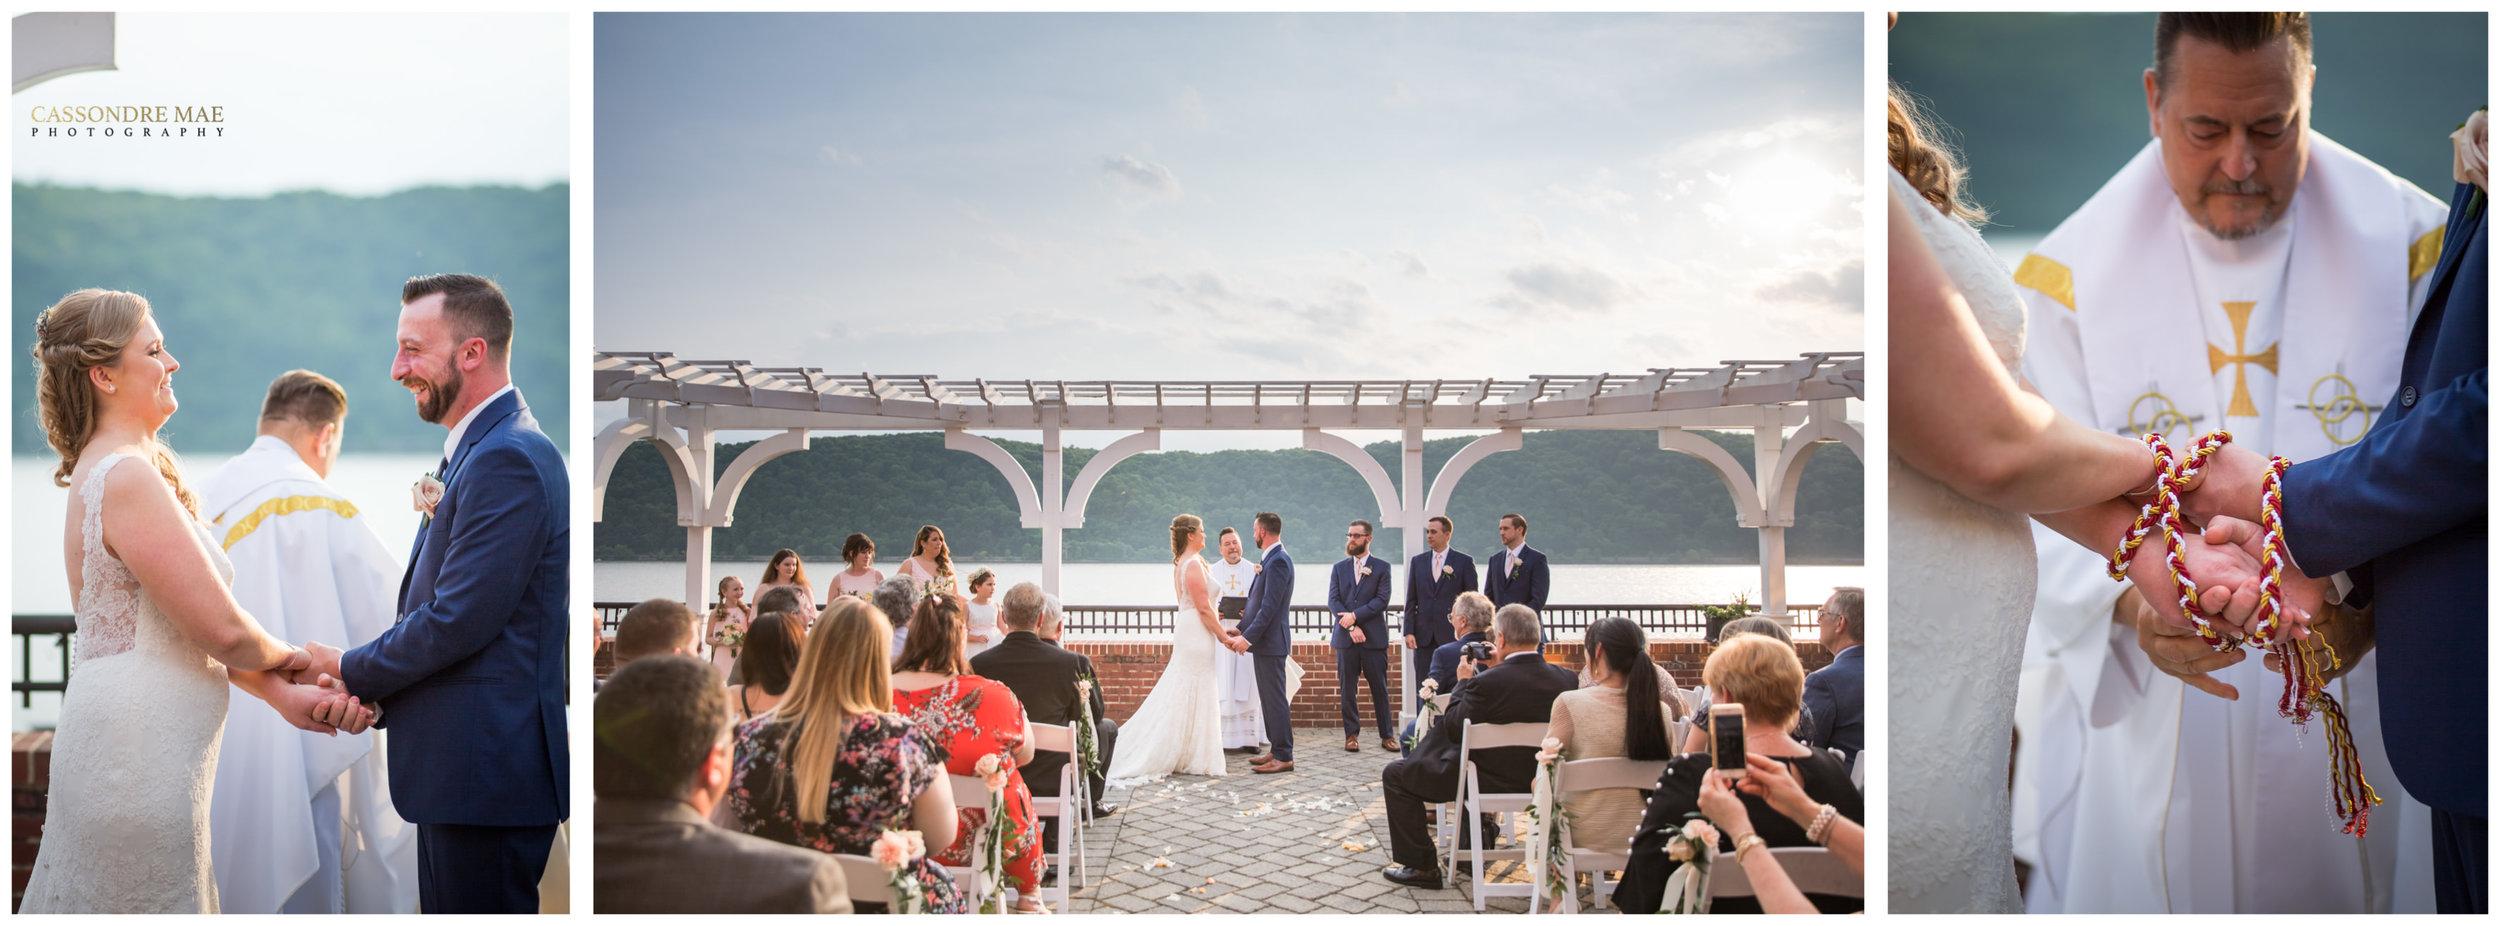 Cassondre Mae Photography Grandview Wedding Photos Poughkeepsie NY Hudson Valley 14.jpg